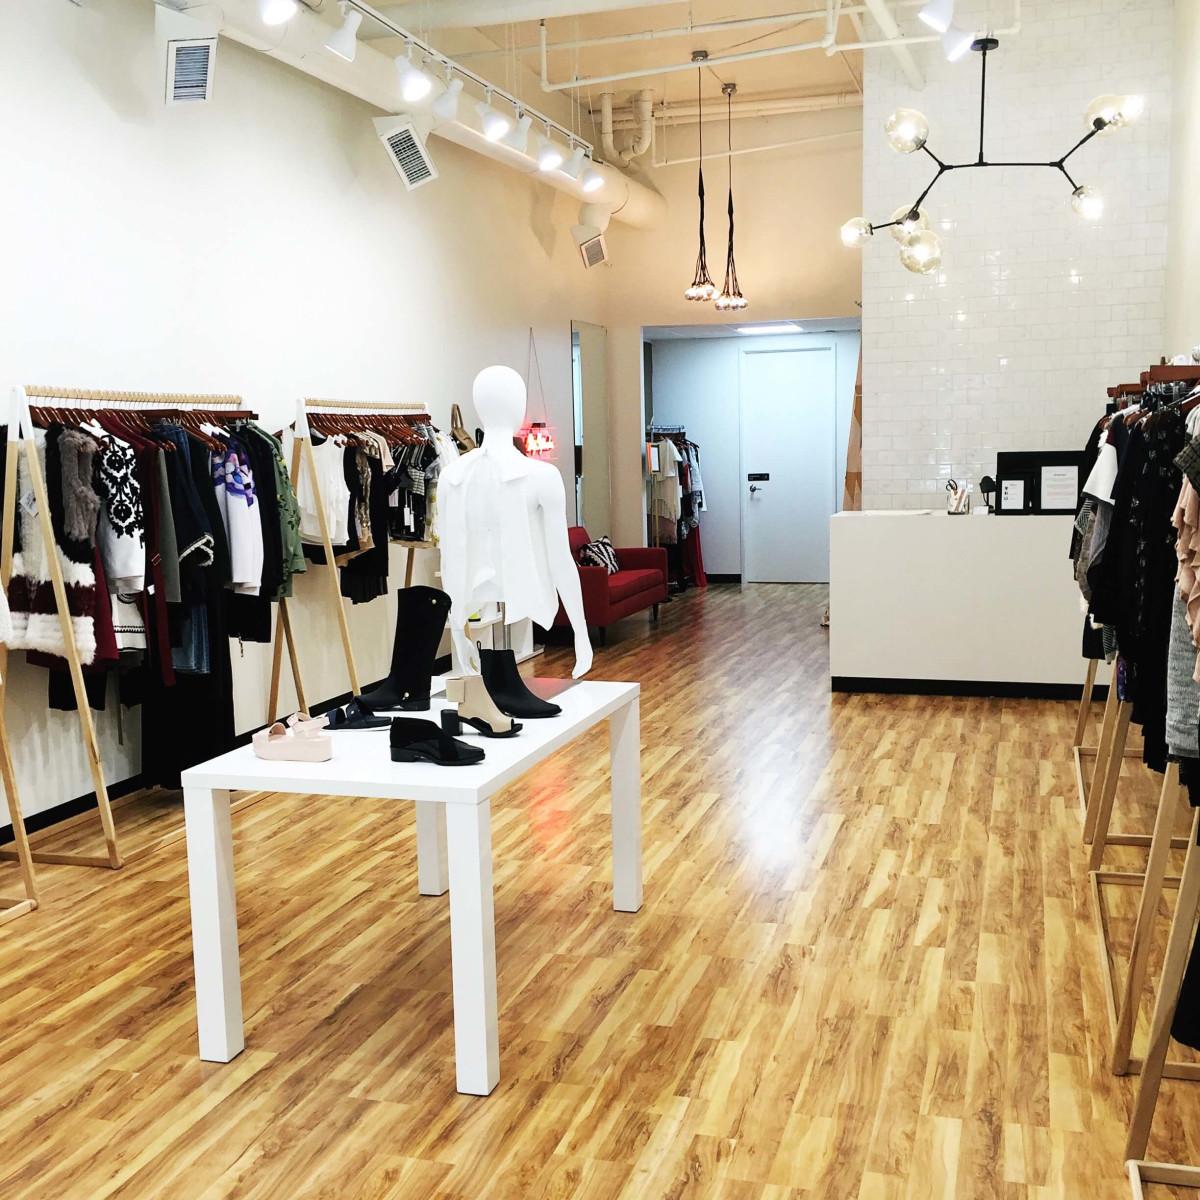 ShopSeptember at West Village in Dallas